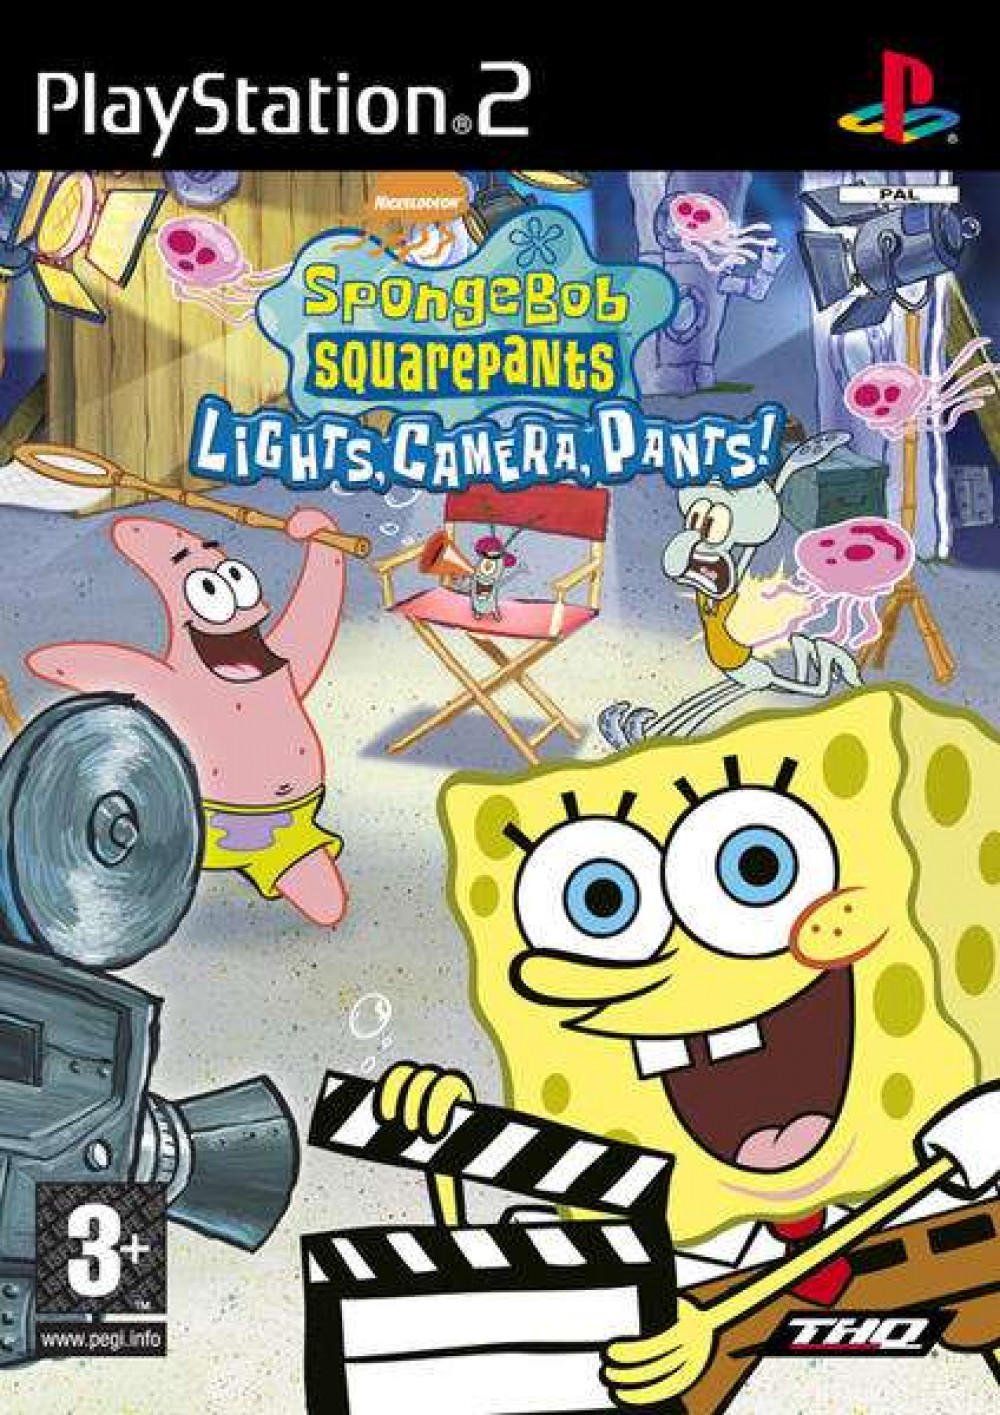 Spongebob Squarepants Lights Camera Pants PS2